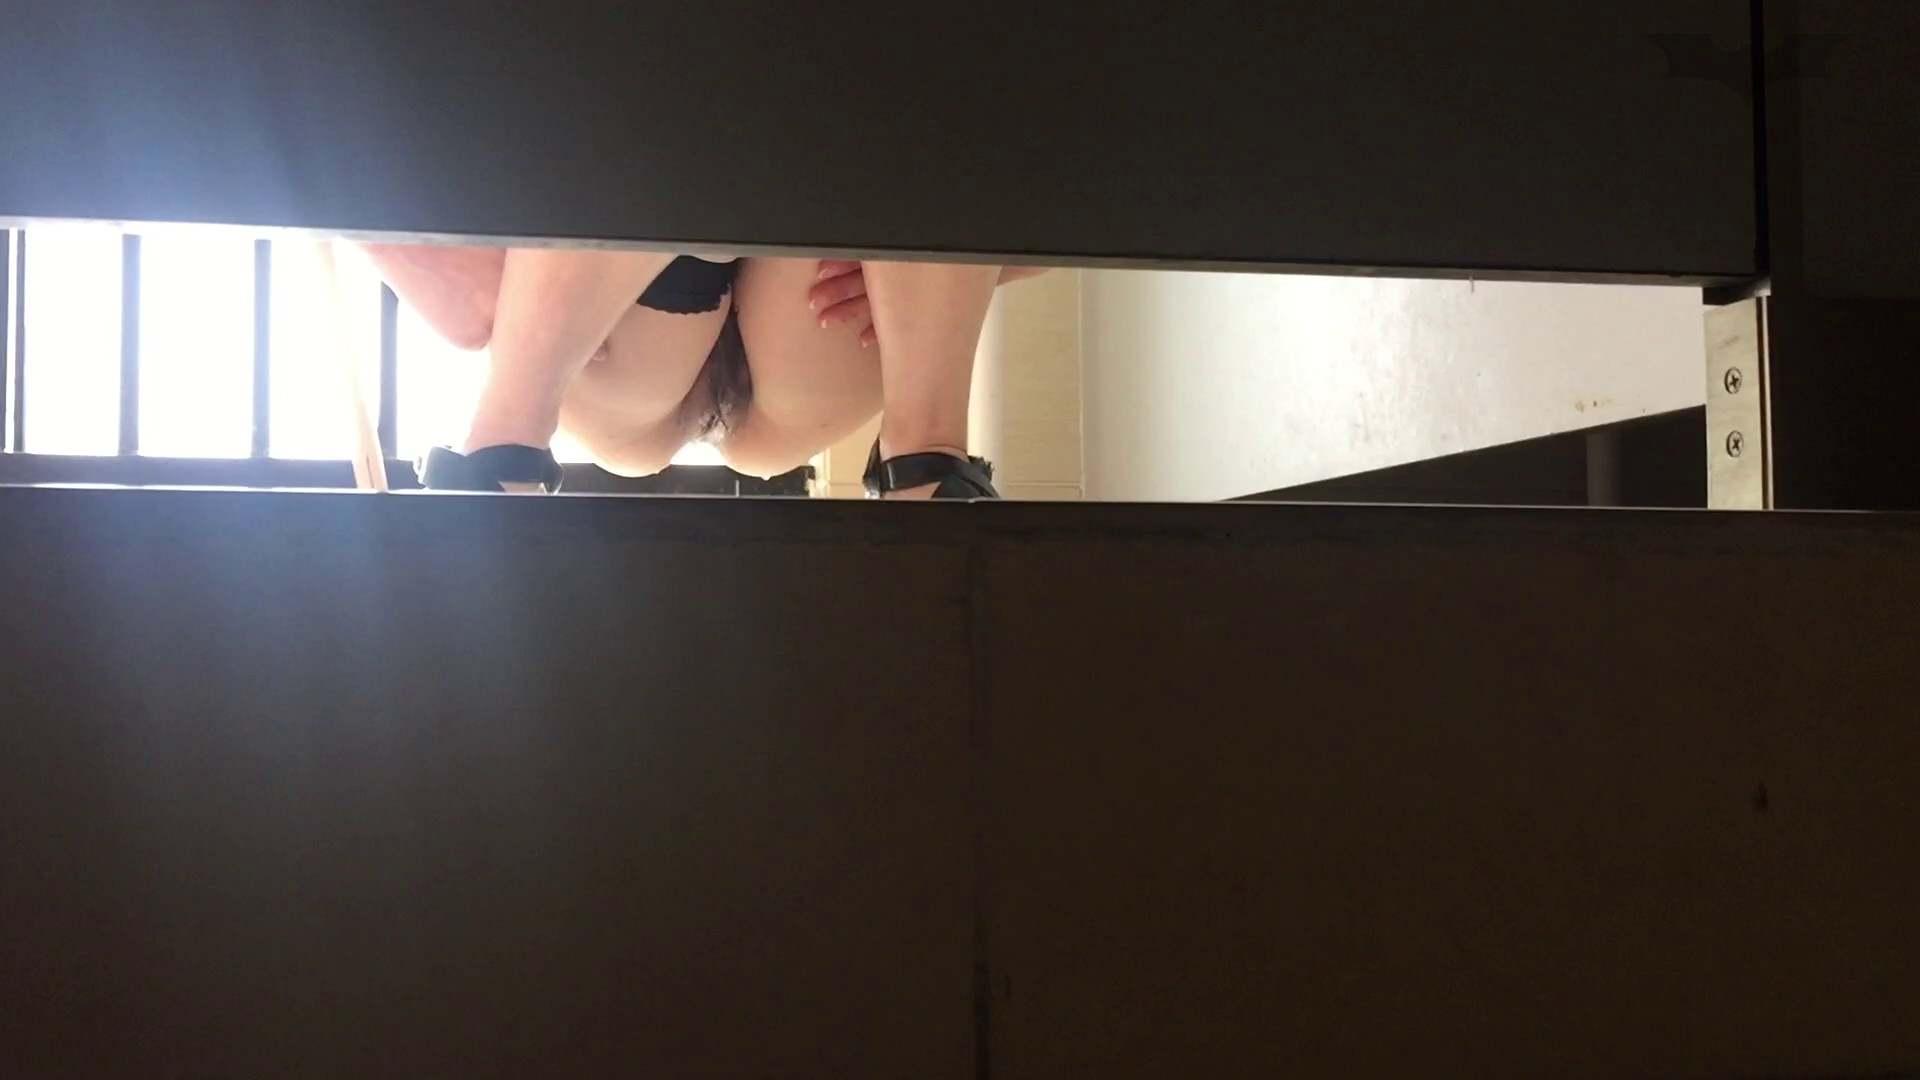 JD盗撮 美女の洗面所の秘密 Vol.73 美肌 戯れ無修正画像 67画像 34